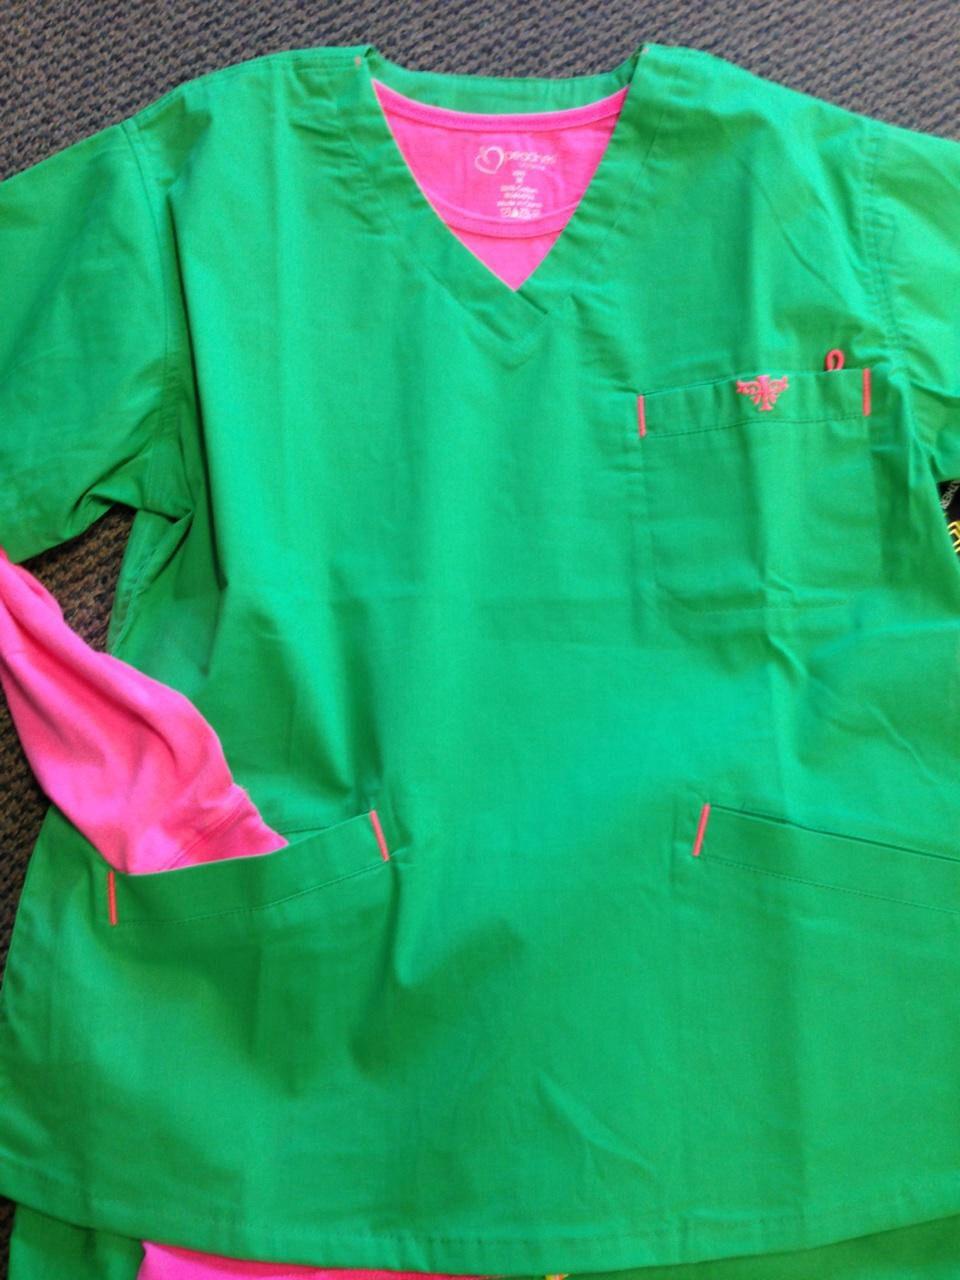 green brightandbold Make a statement! Now in stock